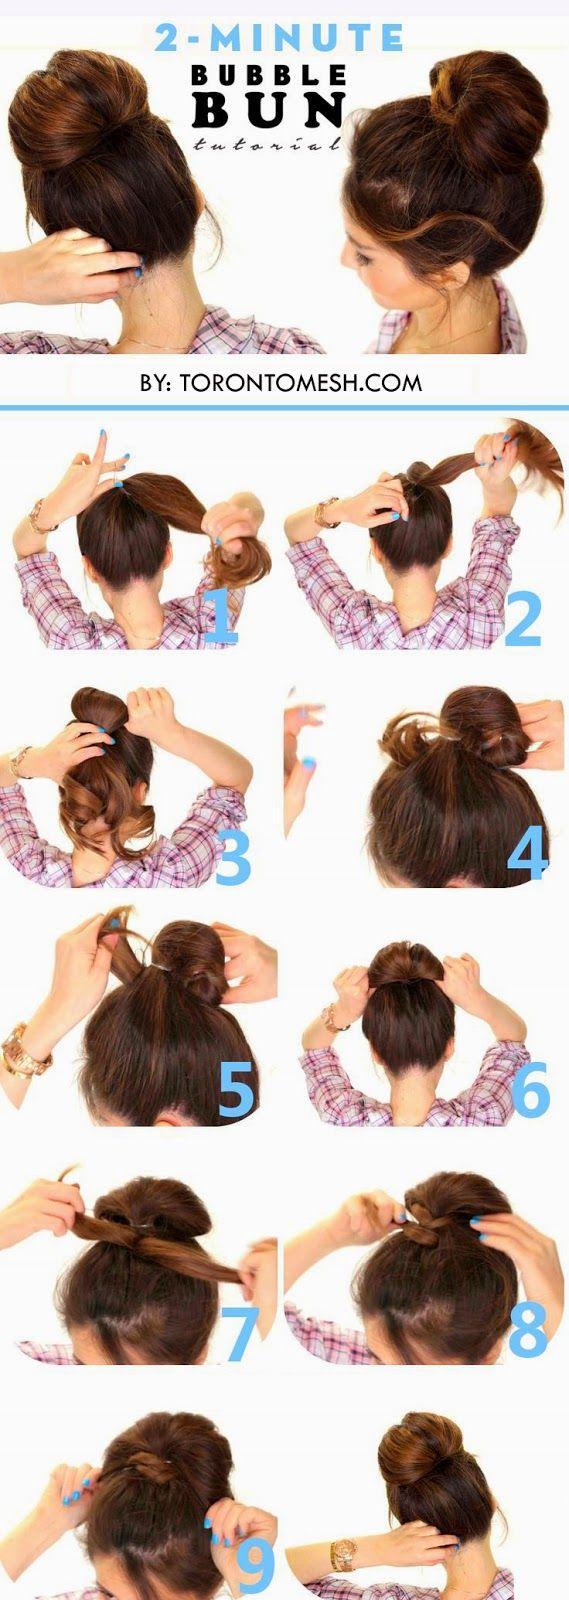 Toronto, Calgary, Edmonton, Montreal, Vancouver, Ottawa, Winnipeg, ON: 2 Minute Bubble Bun Hairstyle Tutorial